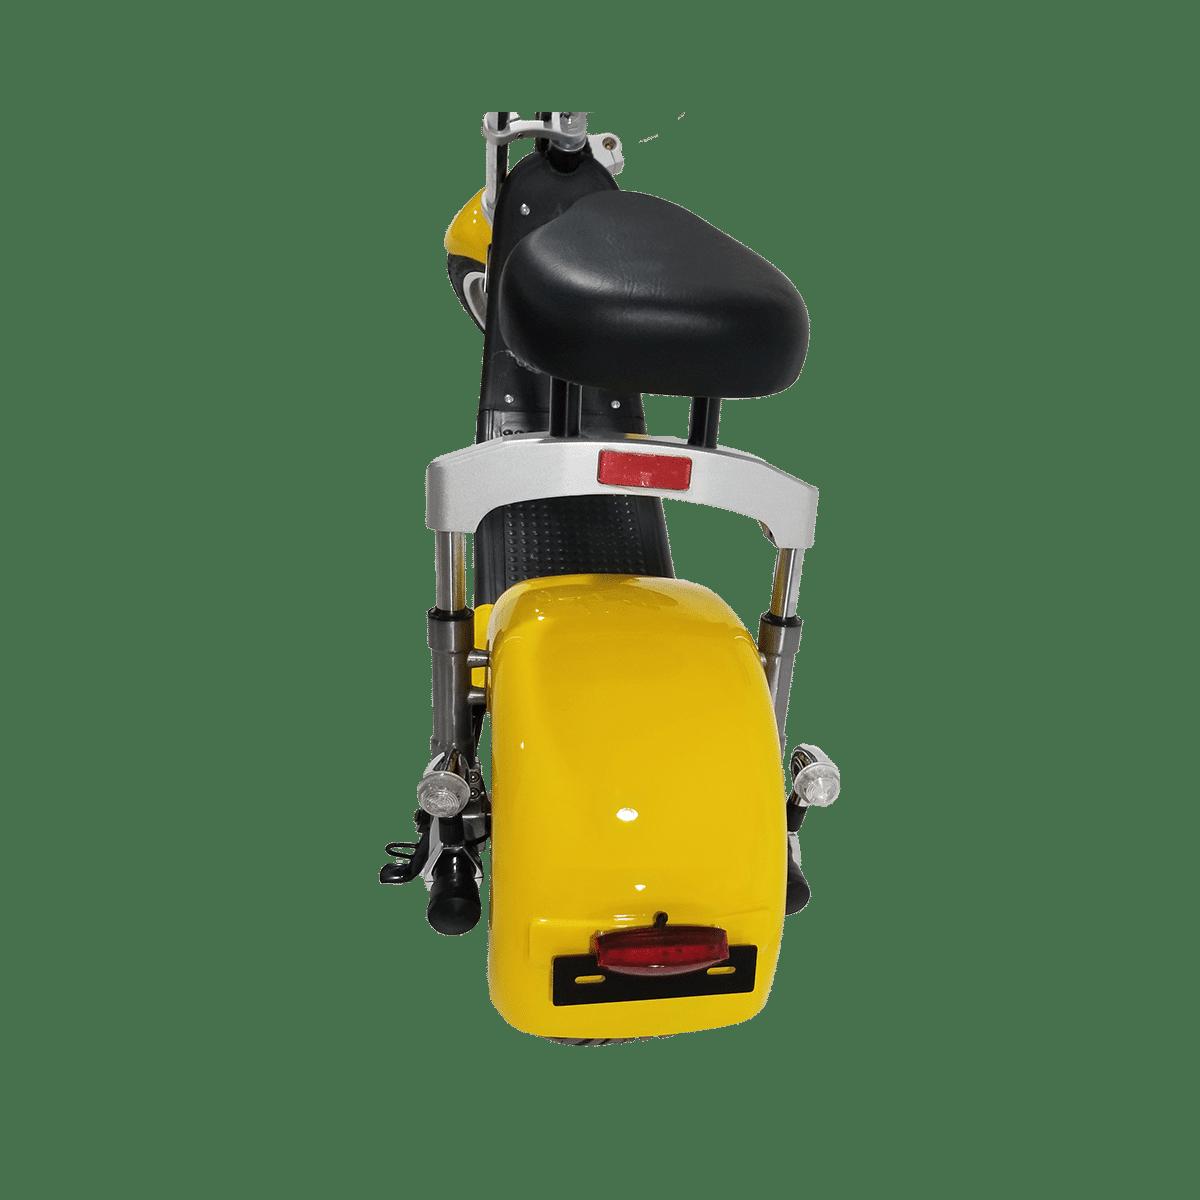 Citycoco Harley Deluxe Jaune avec 1 batterie offerte en plus 14